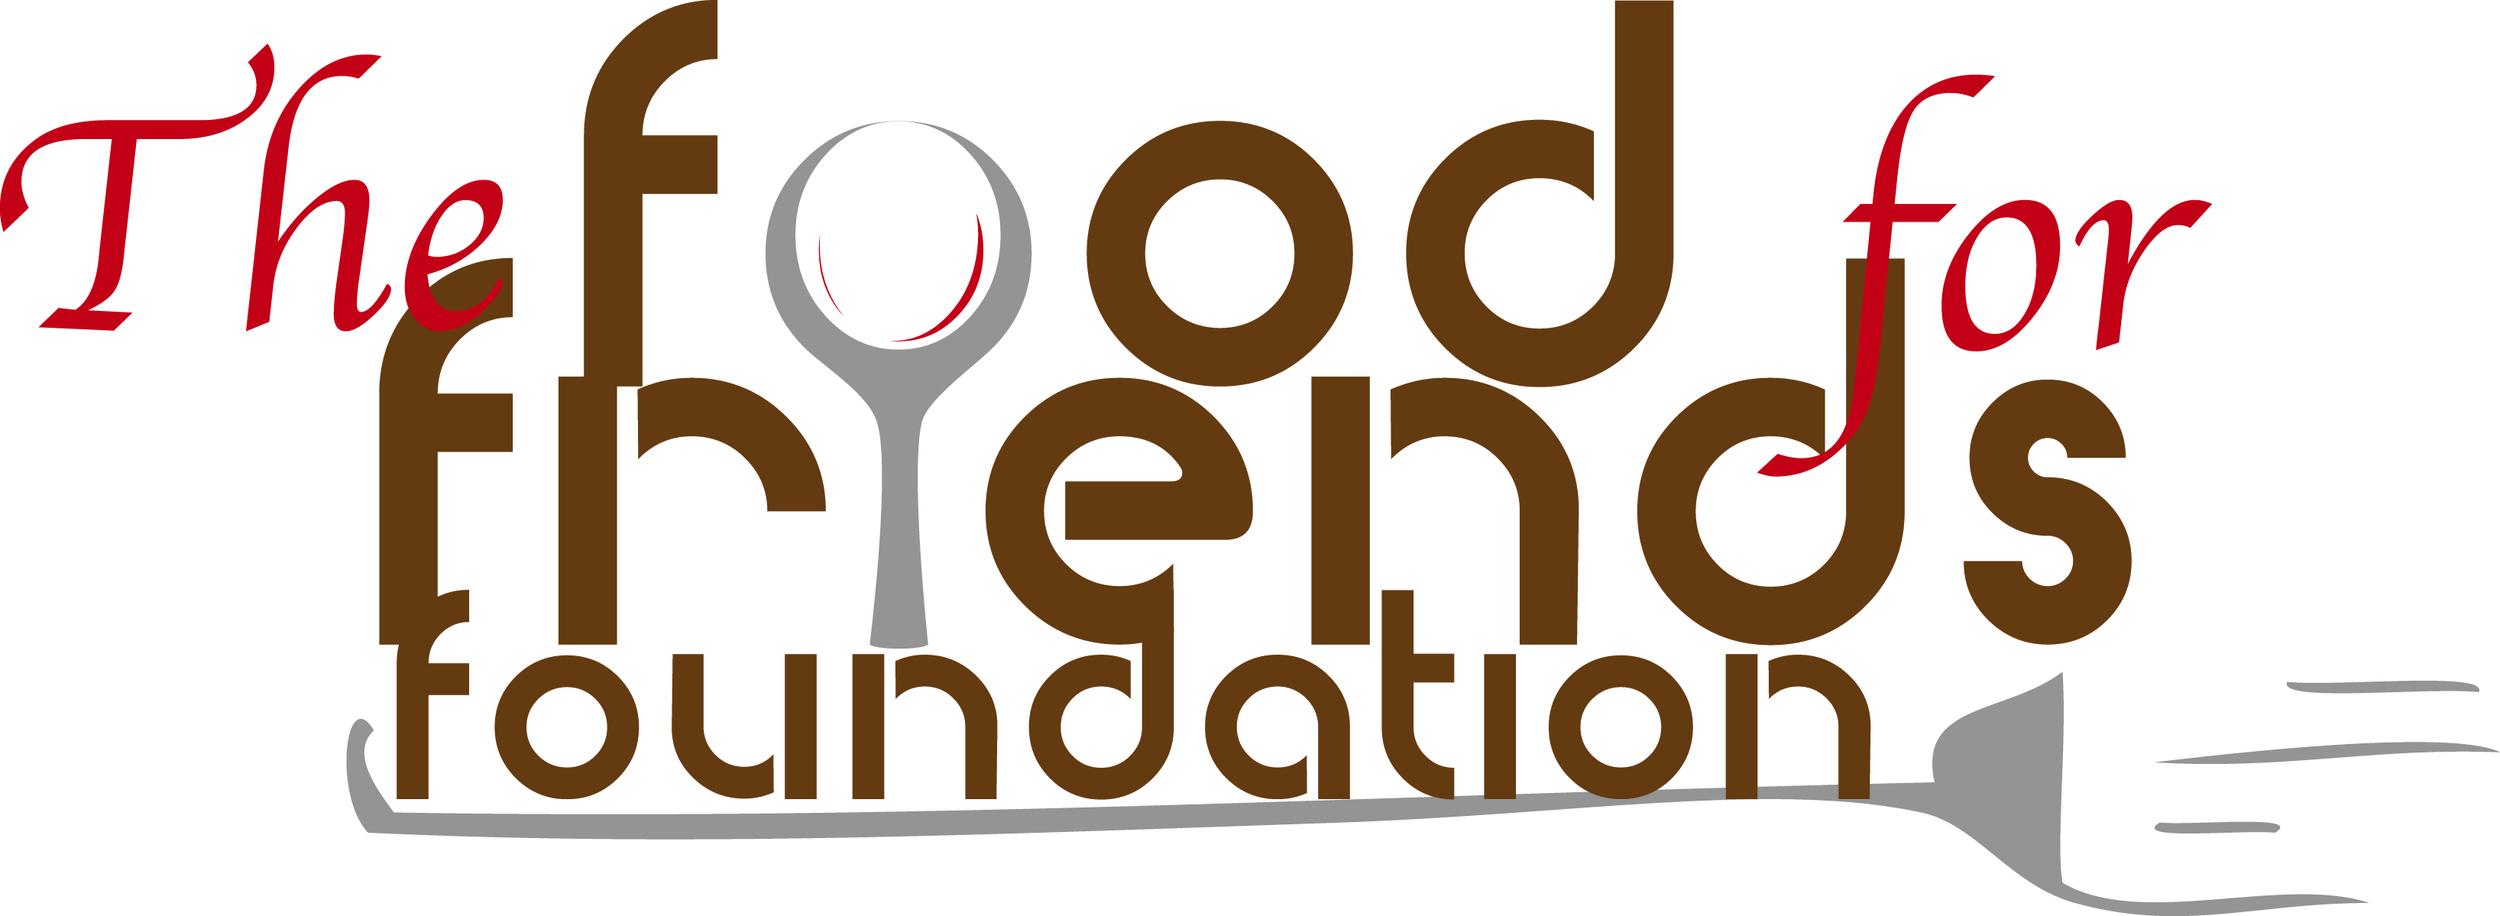 FFF - Food for Friends Foundation